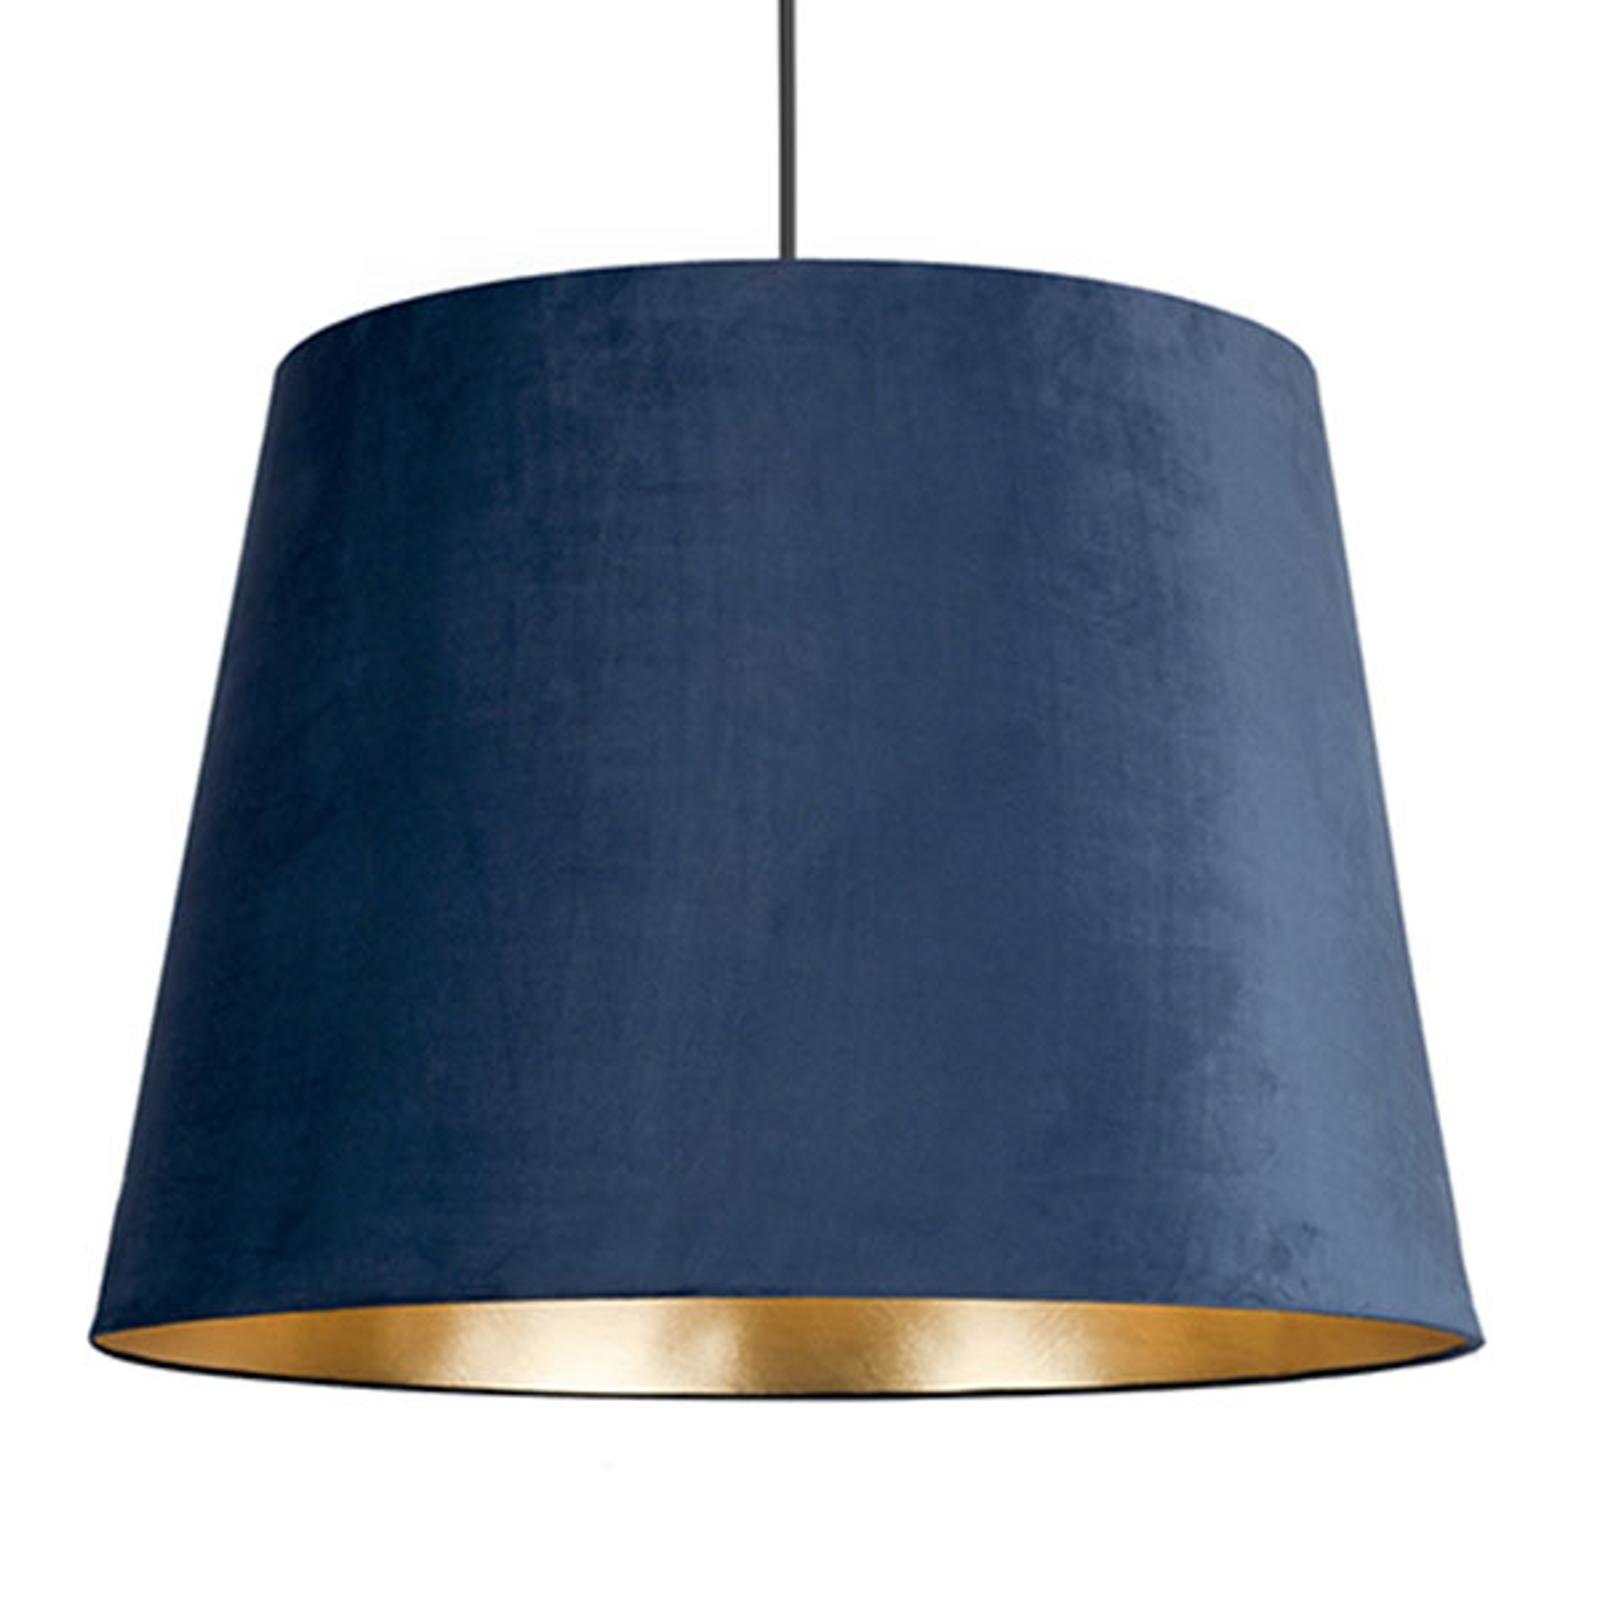 Suspension Cone M abat-jour velours Ø46,5cm bleue